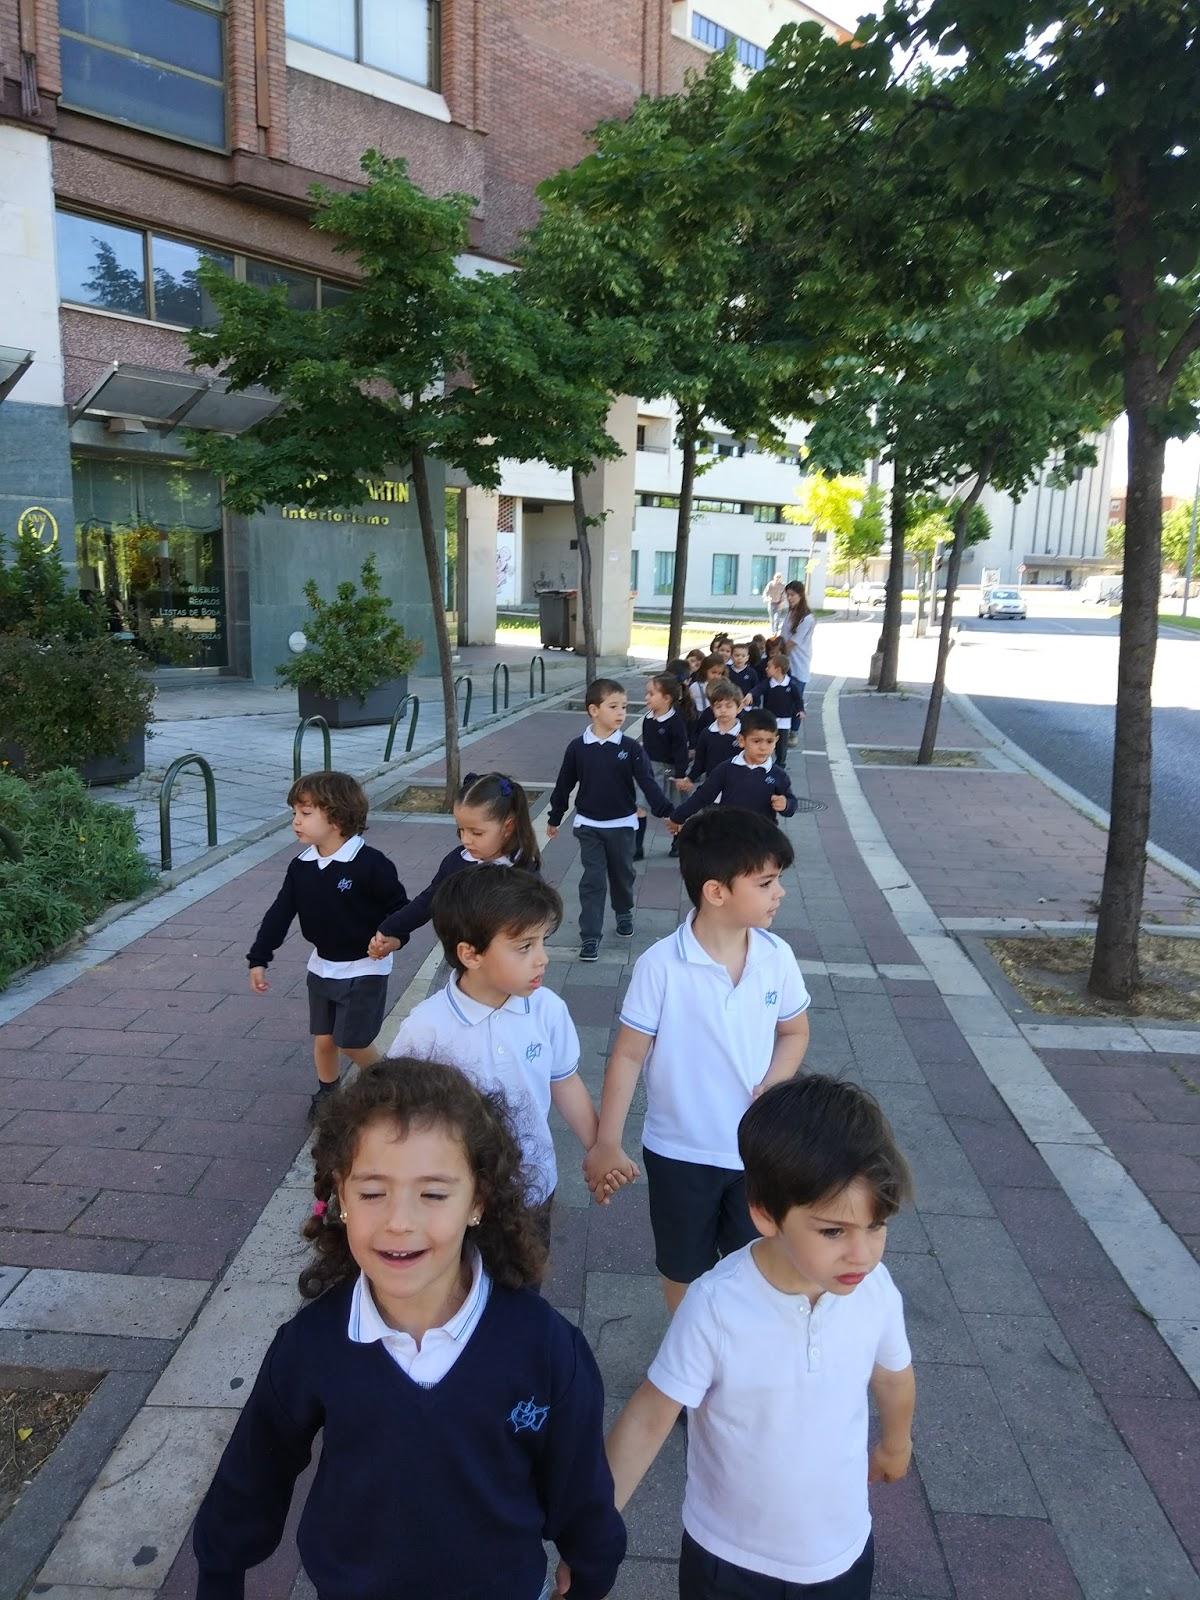 Agustinas Valladolid - 2017 - Infantil 3 - Biblioteca